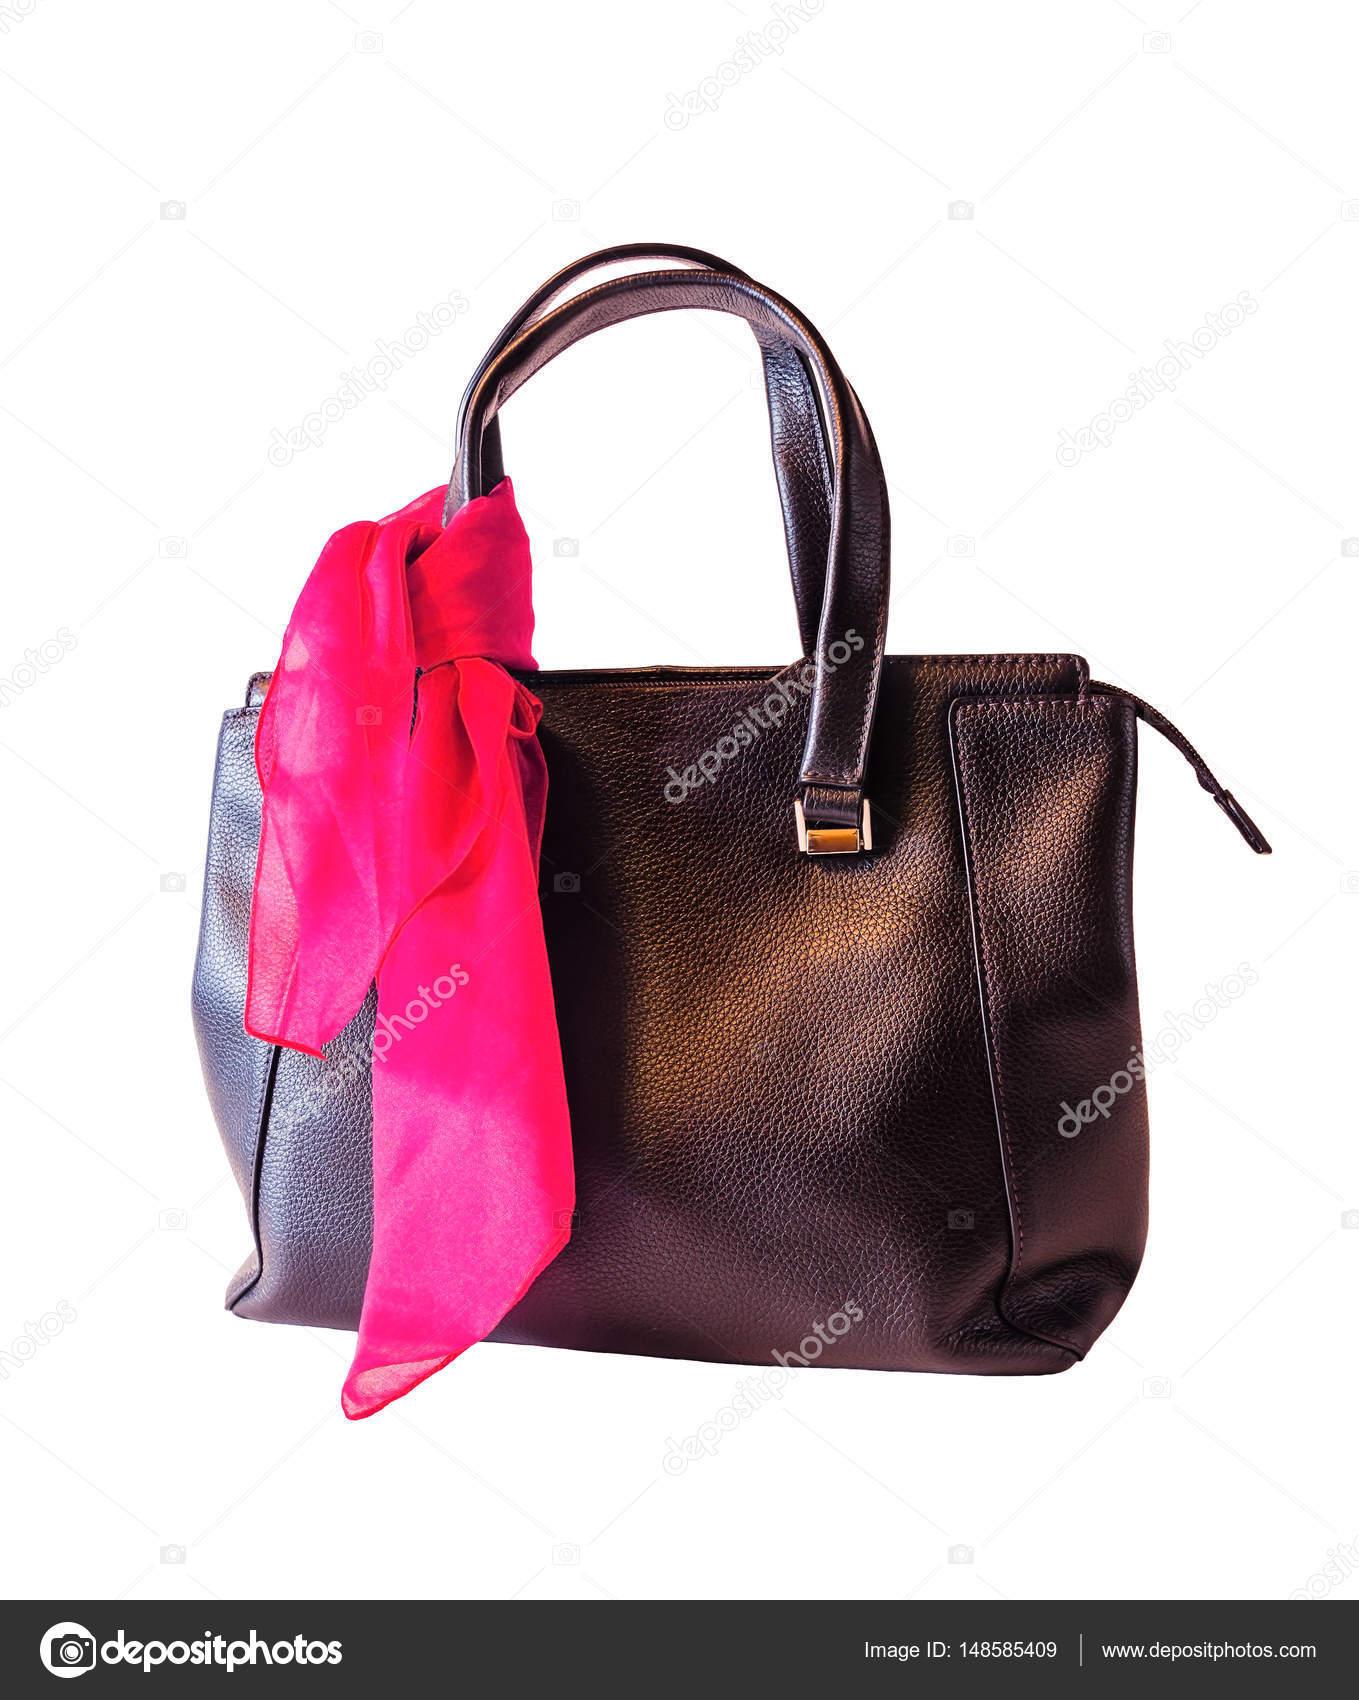 3b1d969129 Μαύρη δερμάτινη τσάντα και ροζ φουλάρι που απομονώνονται σε λευκό φόντο — Εικόνα  από ...